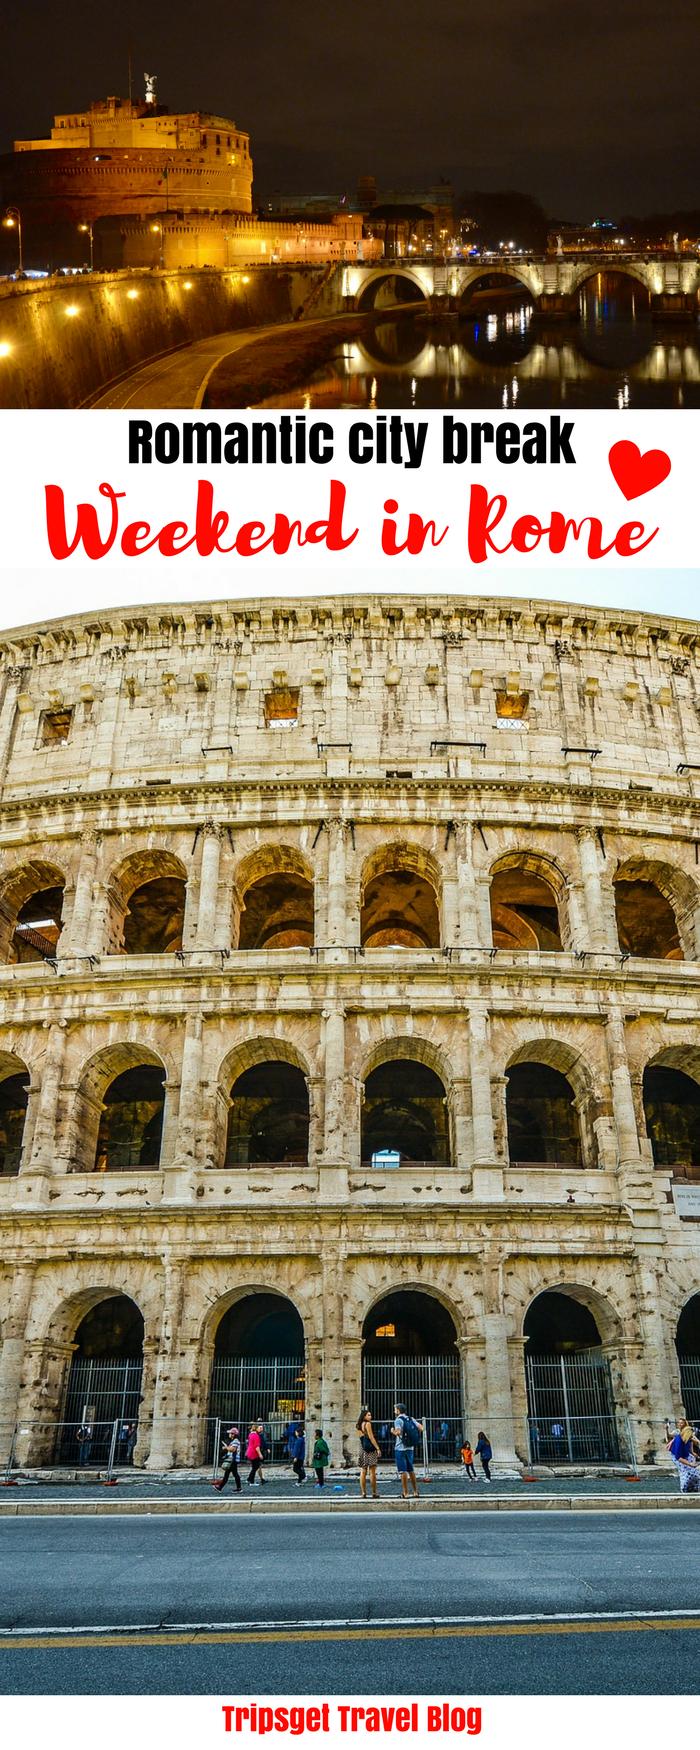 Rome Weekend Break Ideas For A Romantic Getaway Best Weekend